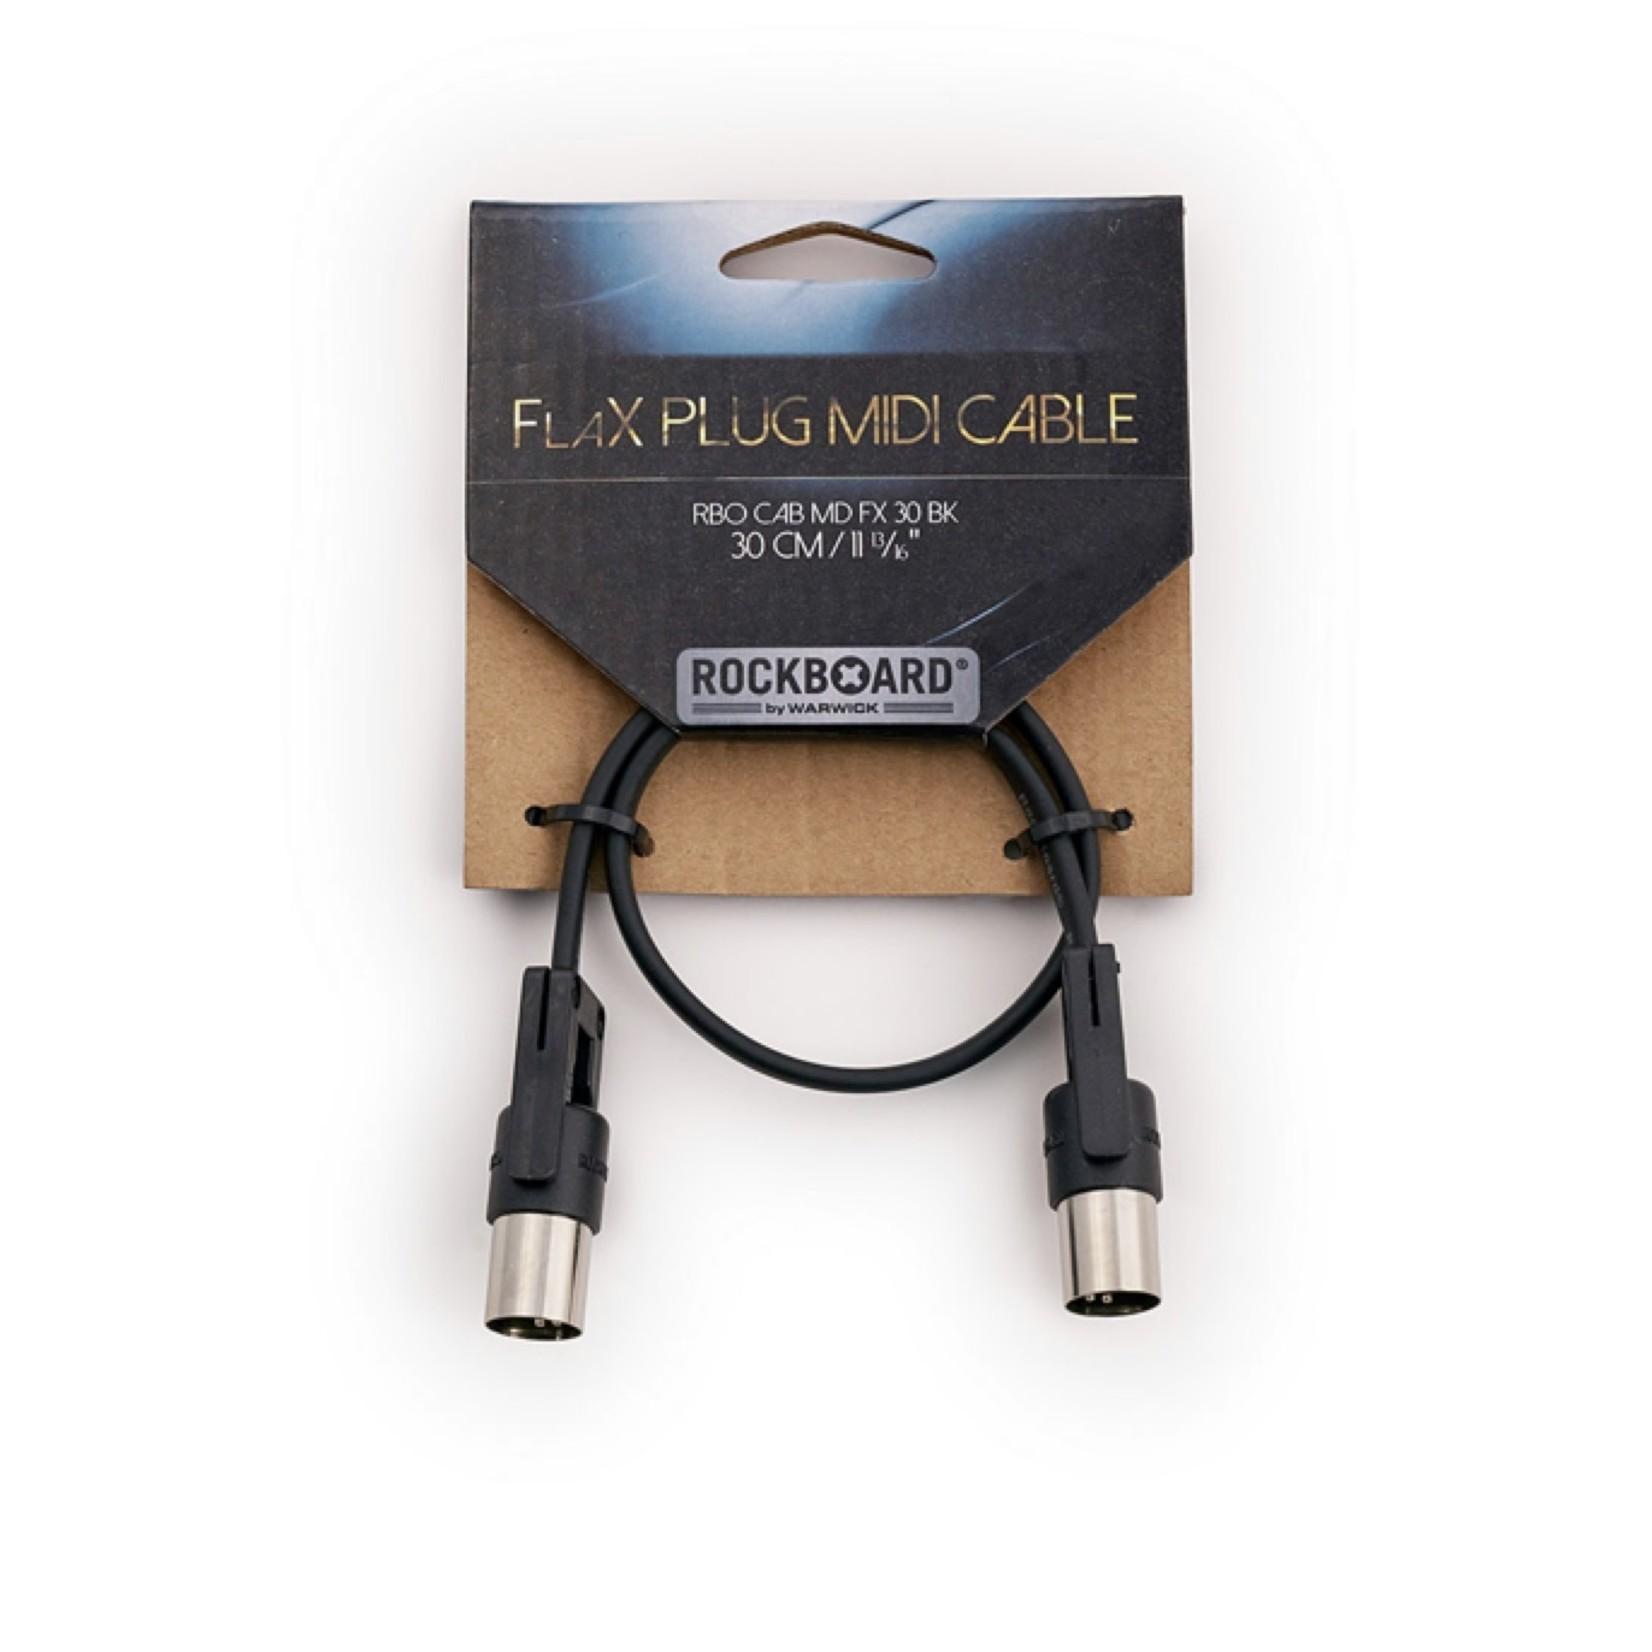 "Rockboard Rockboard FlaX Plug 30cm (11 13/16"") flat MIDI Cable - angle or straight (RBO CAB MD FX 30 BK)"